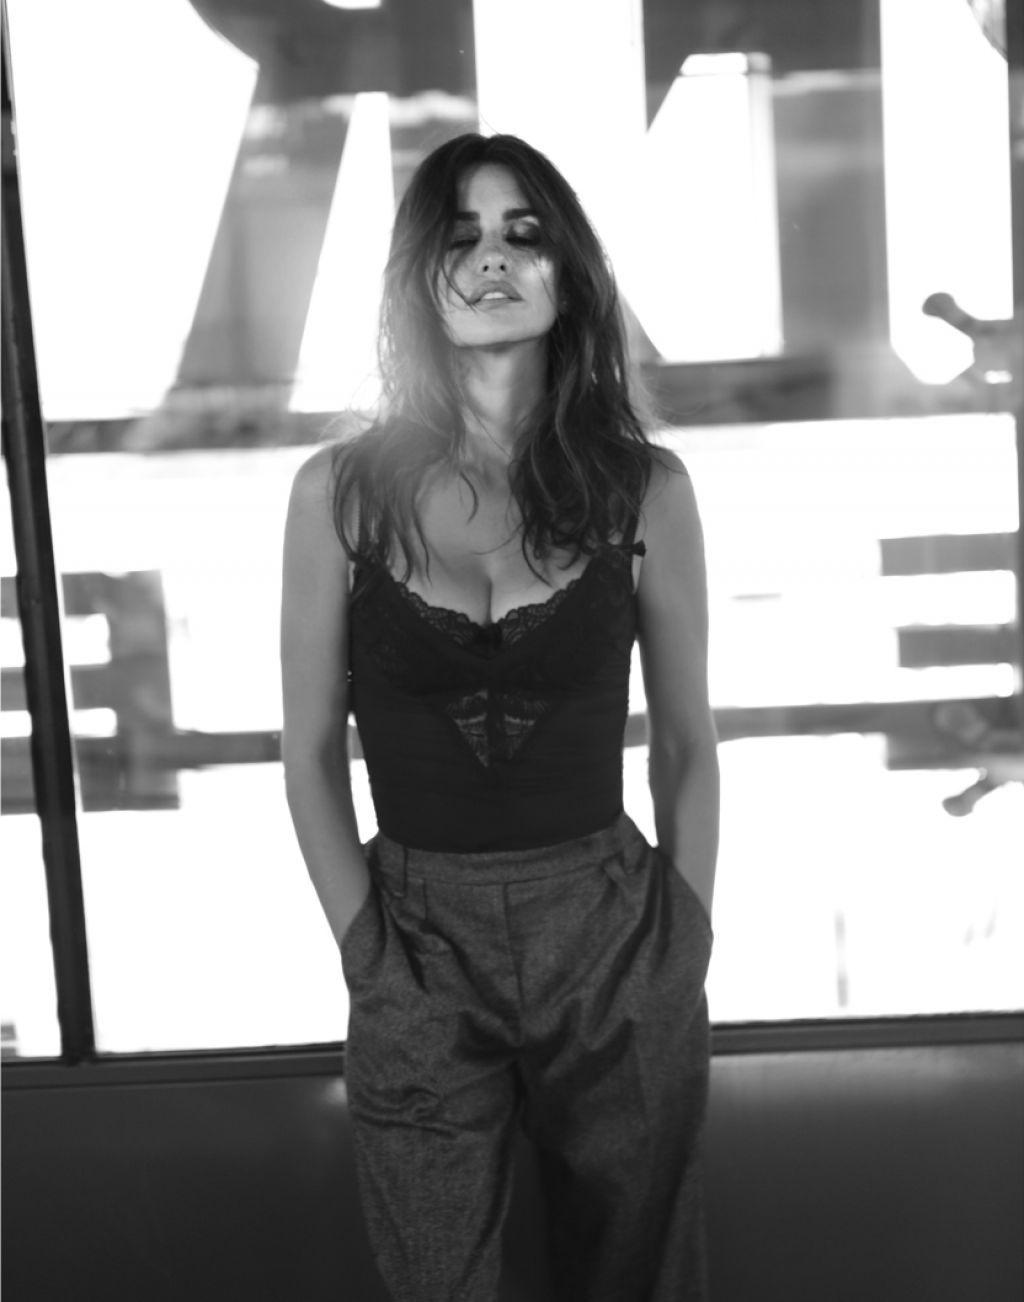 Instagram Penelope Cruz nude photos 2019